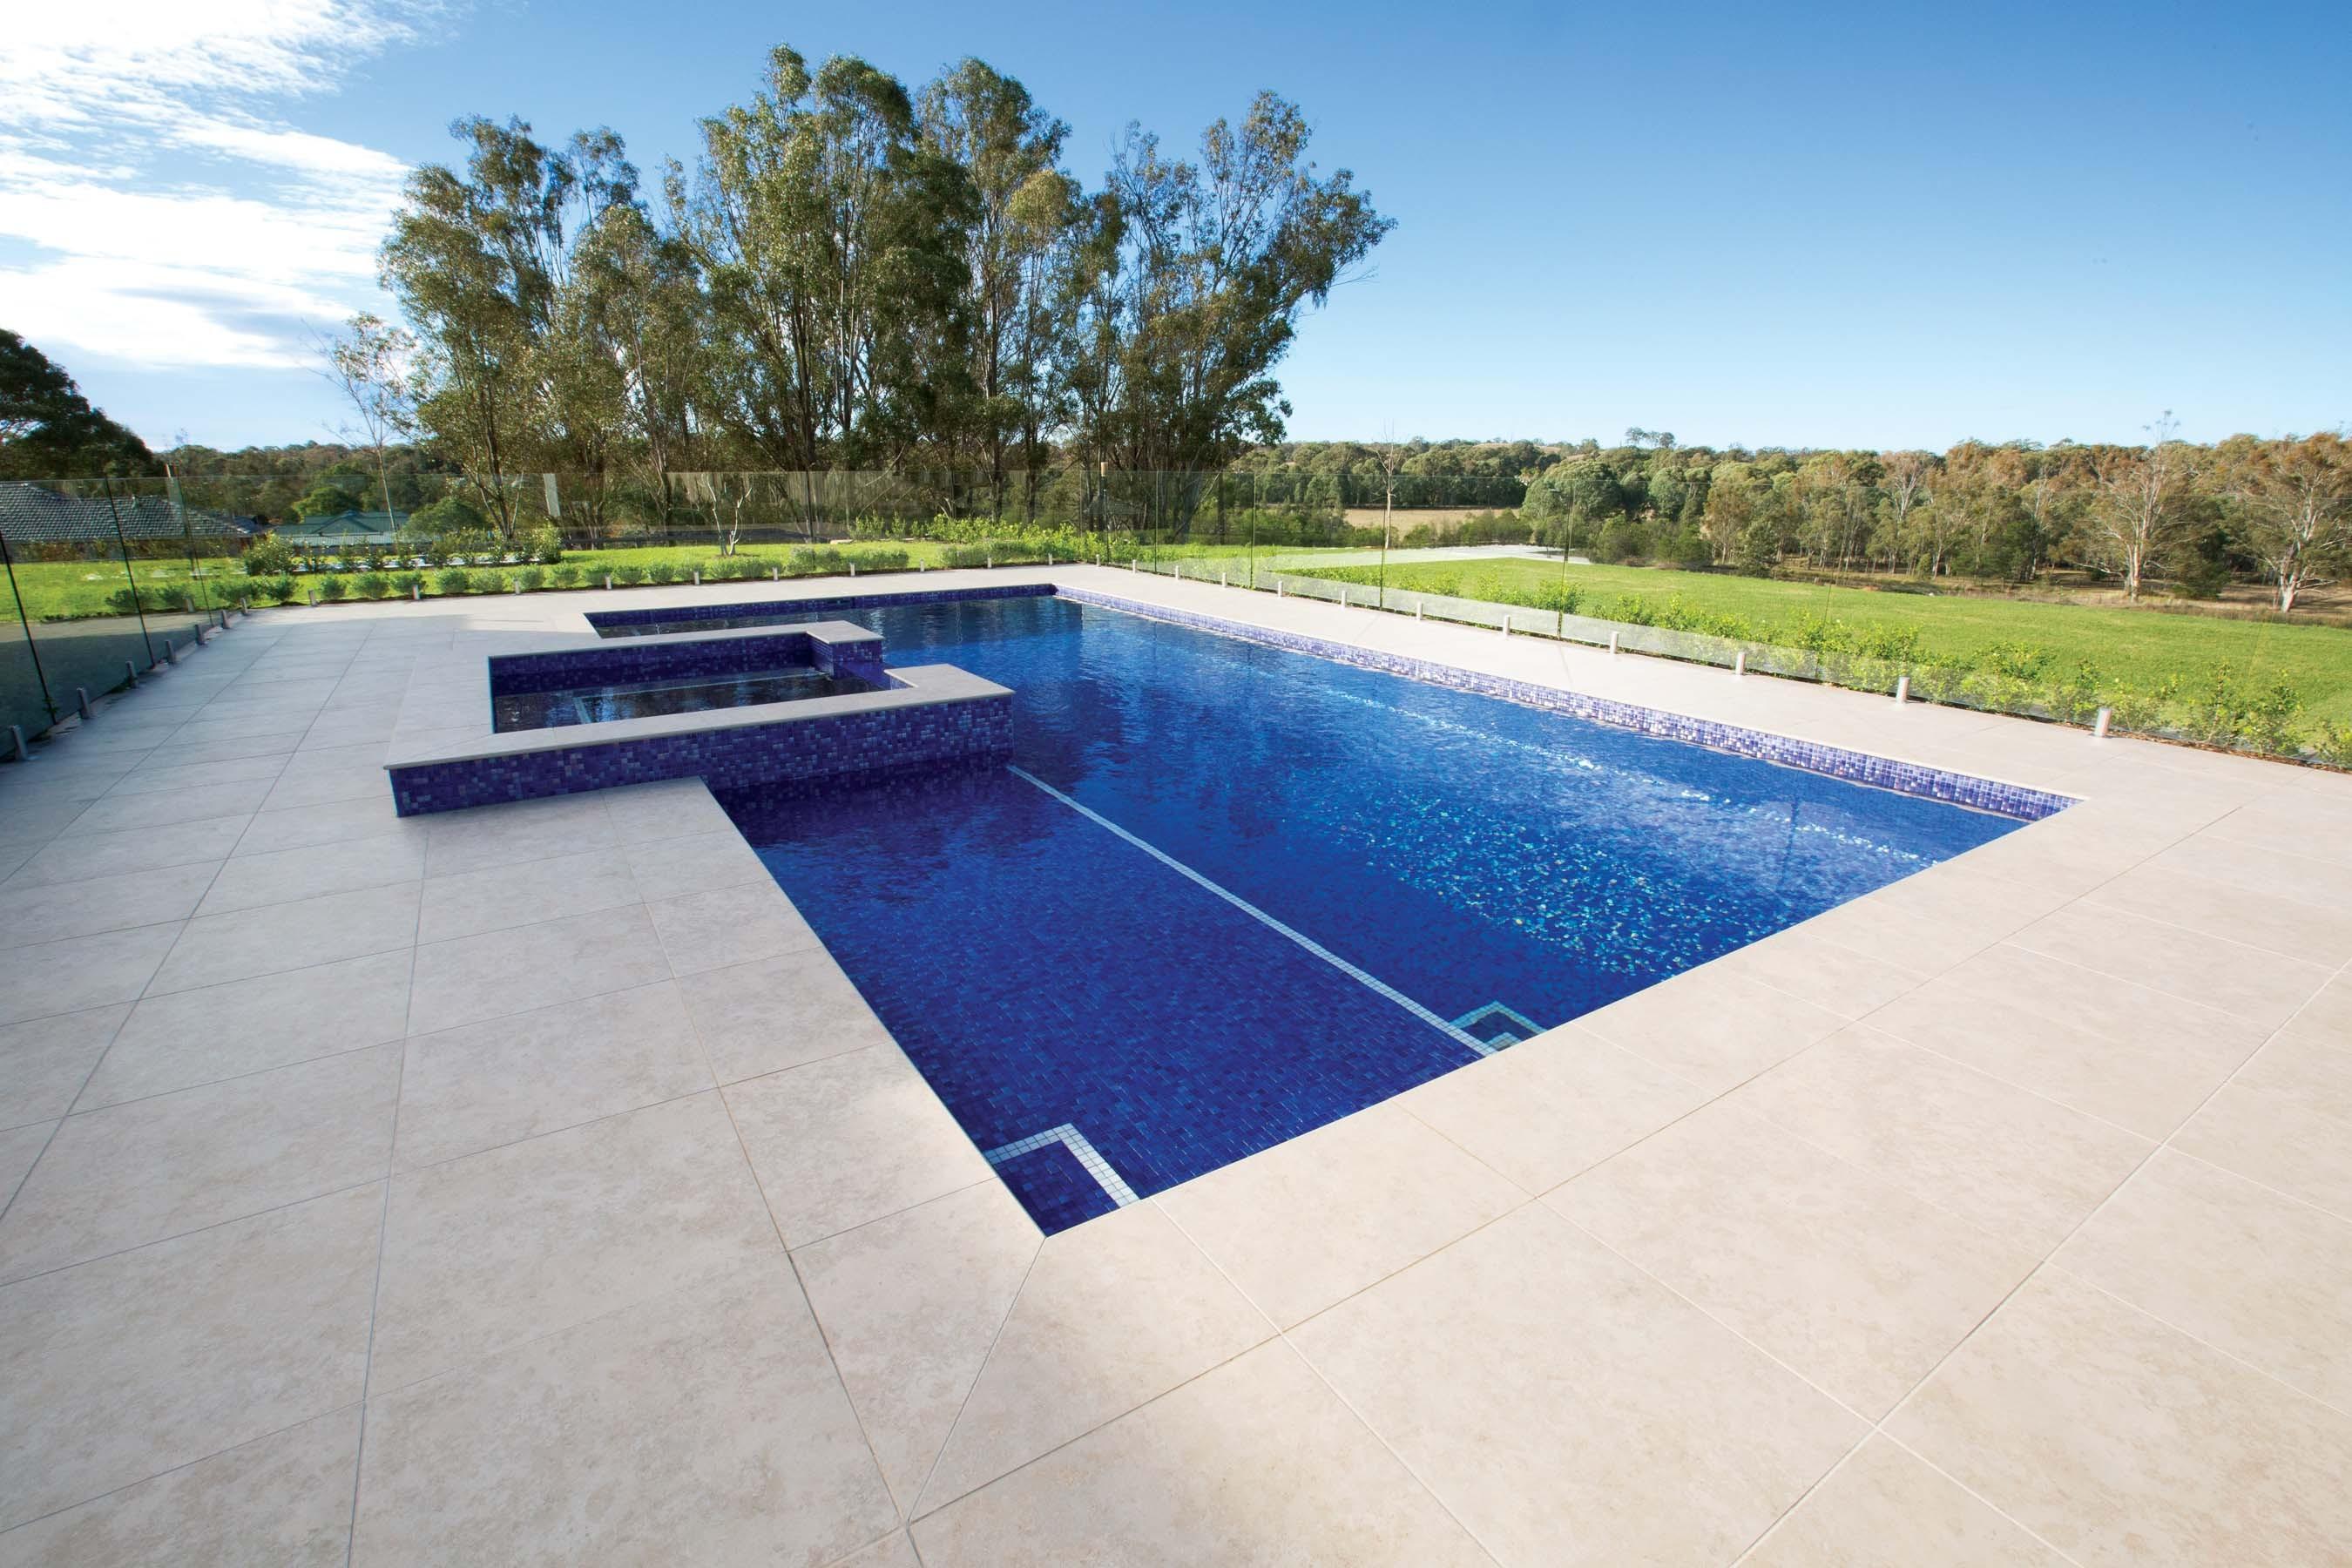 Pool-Tiles Gallery Australian narooma-04